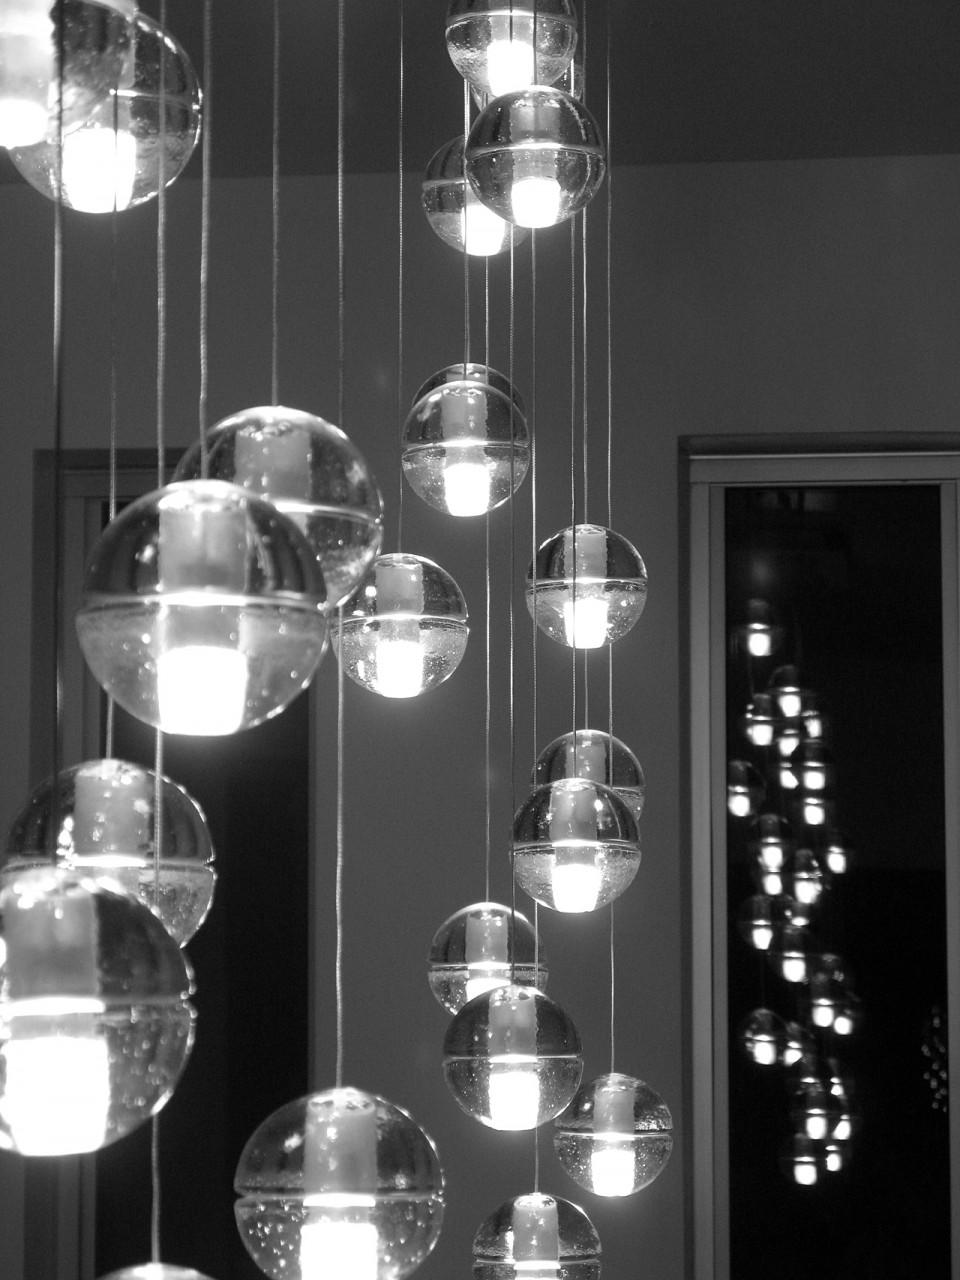 Bocci pluie de luminaires intemporels venu du canada for Luminaire lustre design